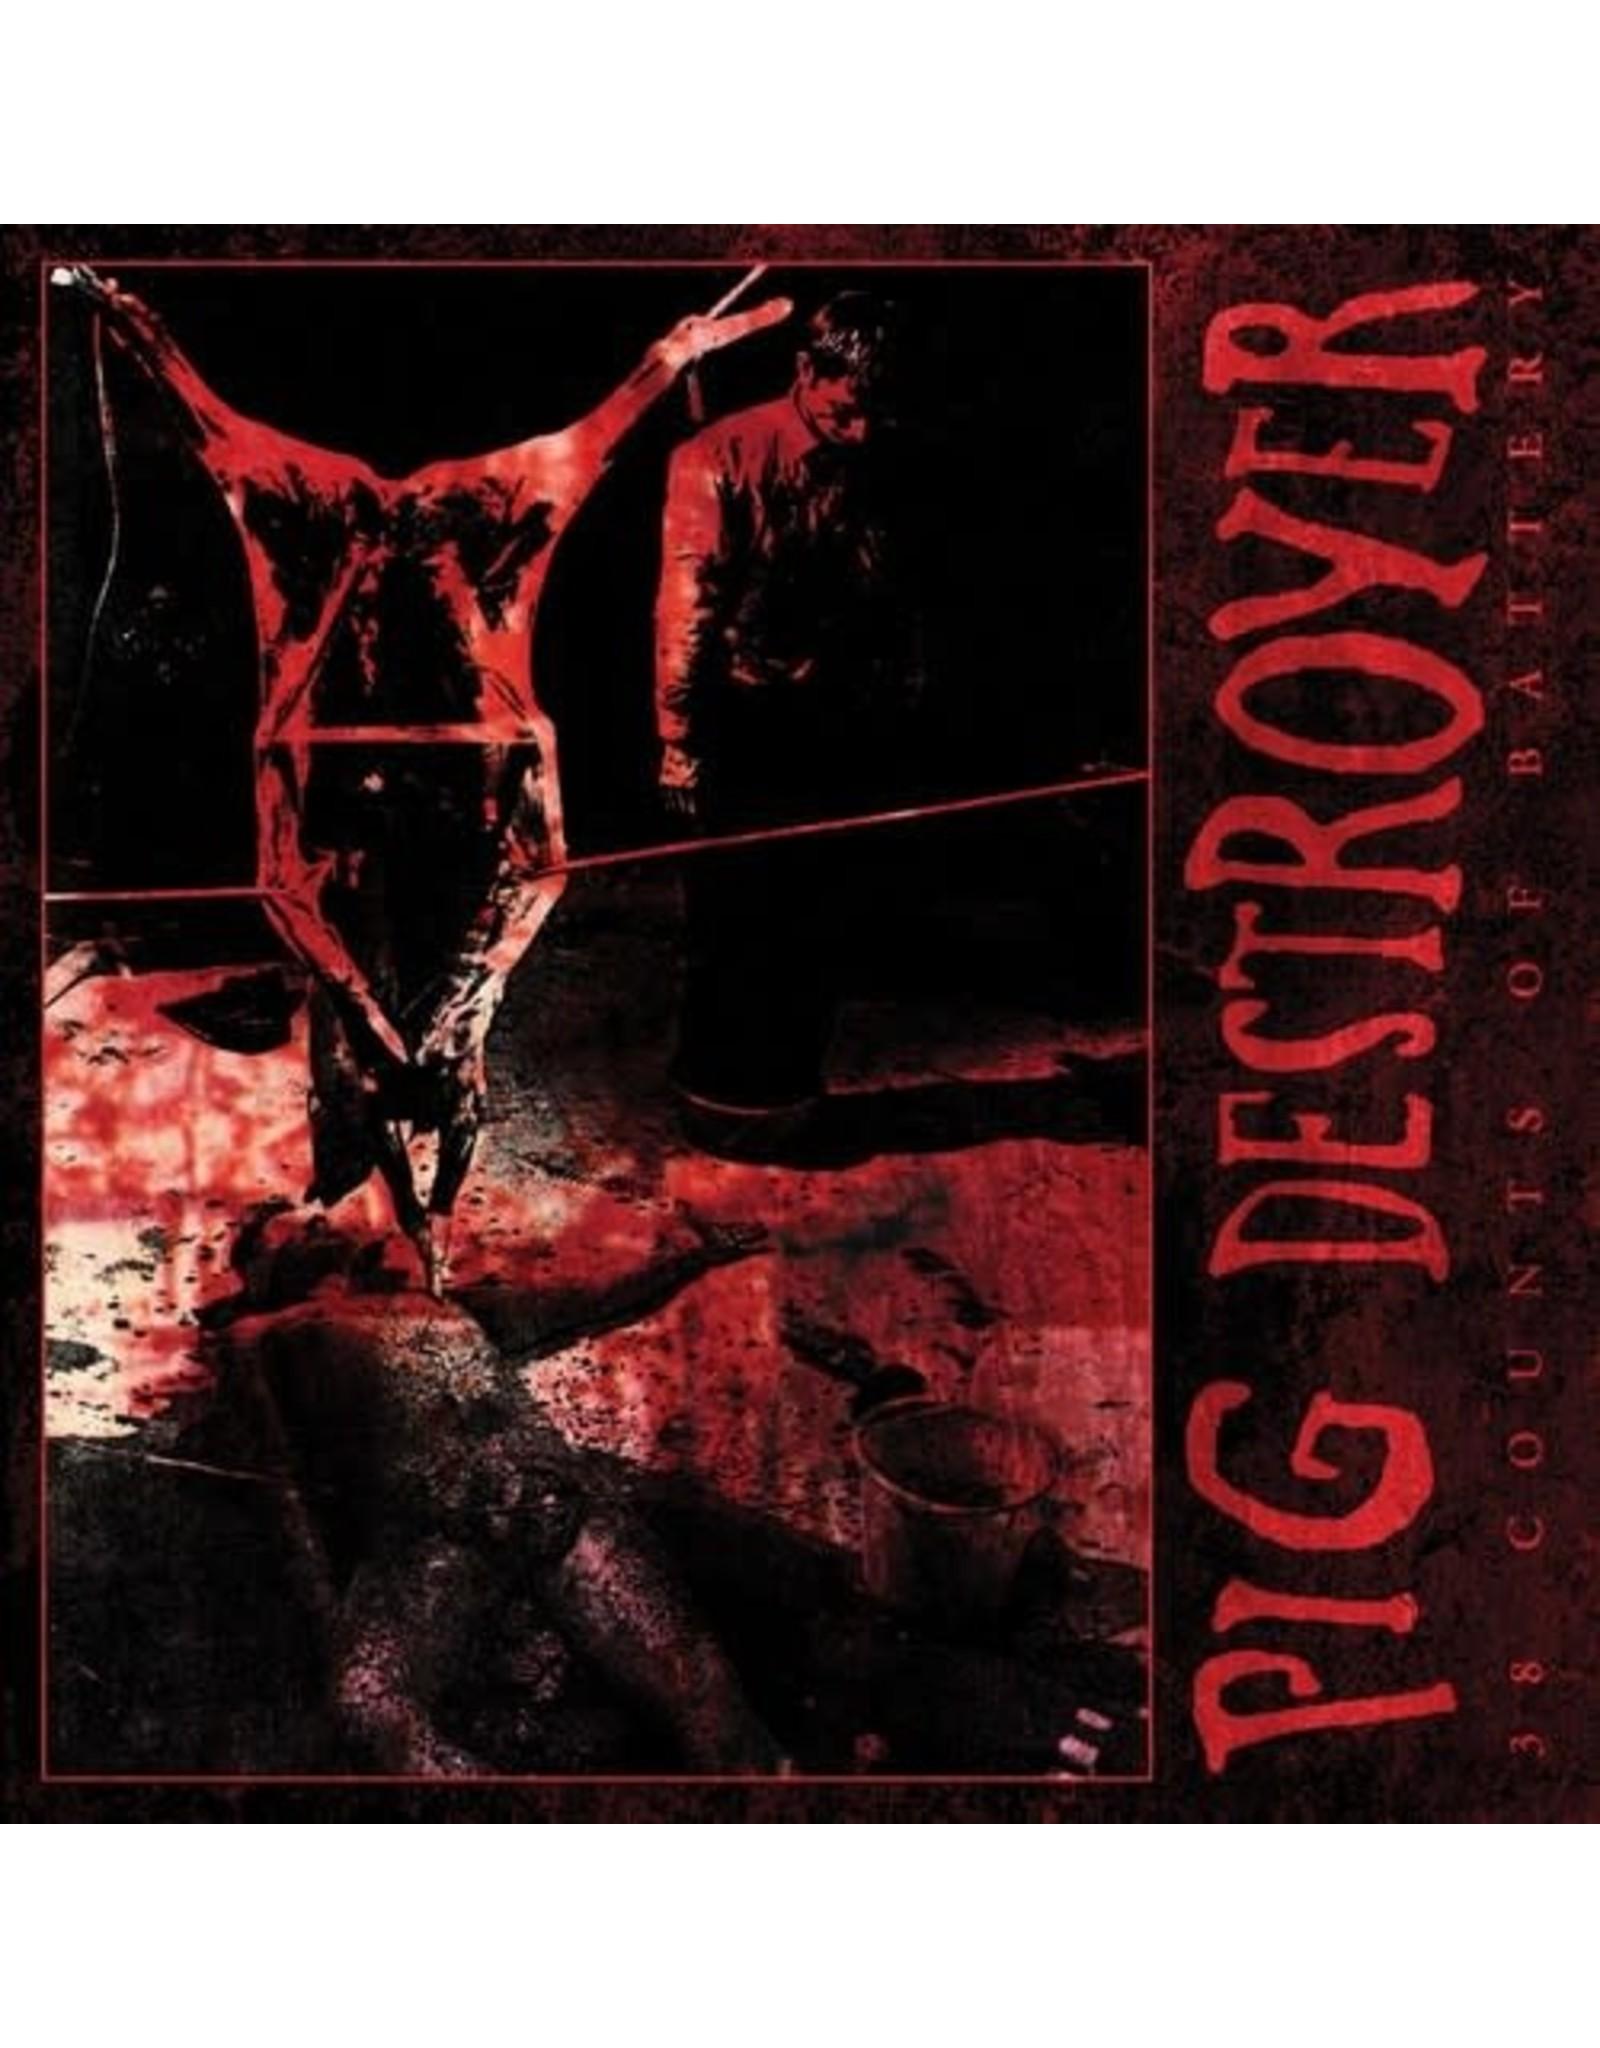 New Vinyl Pig Destroyer - 38 Counts Of Battery LP